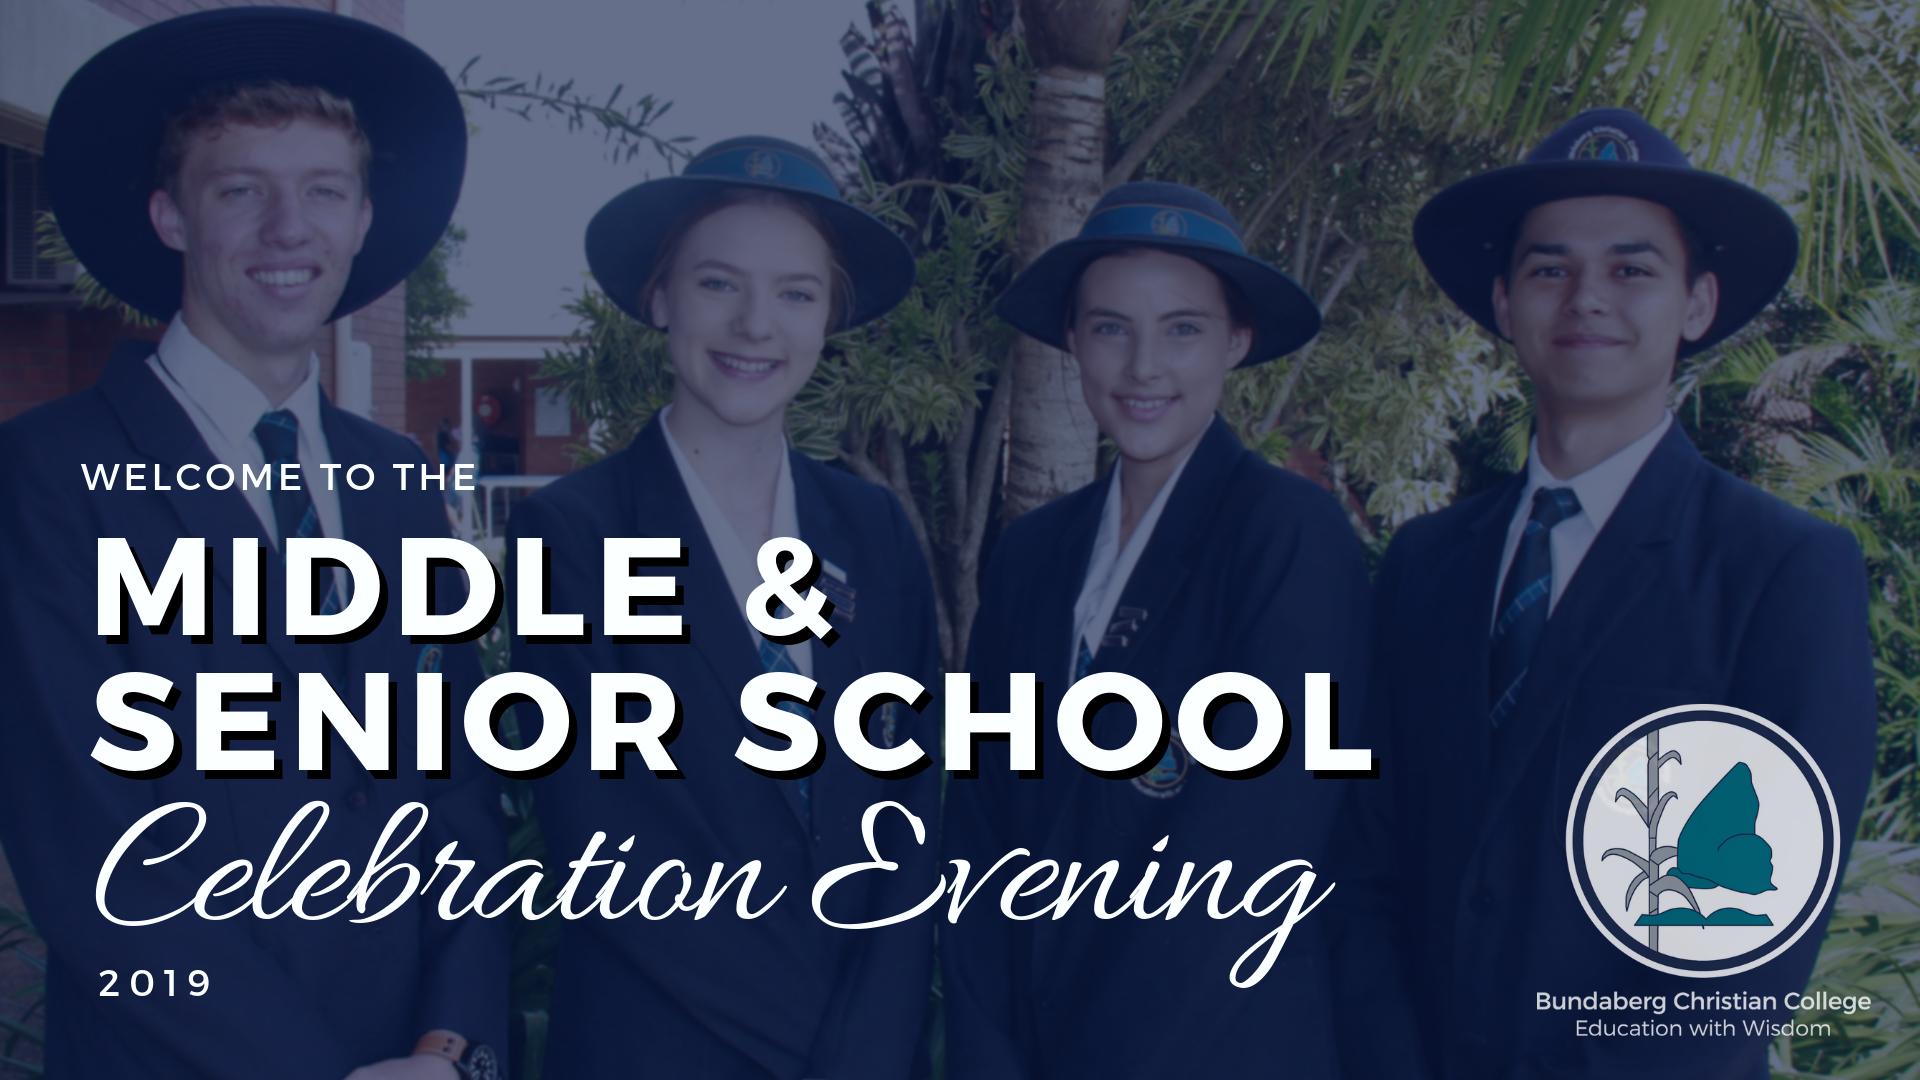 Middle Senior School Celebration Evening Ppt 1